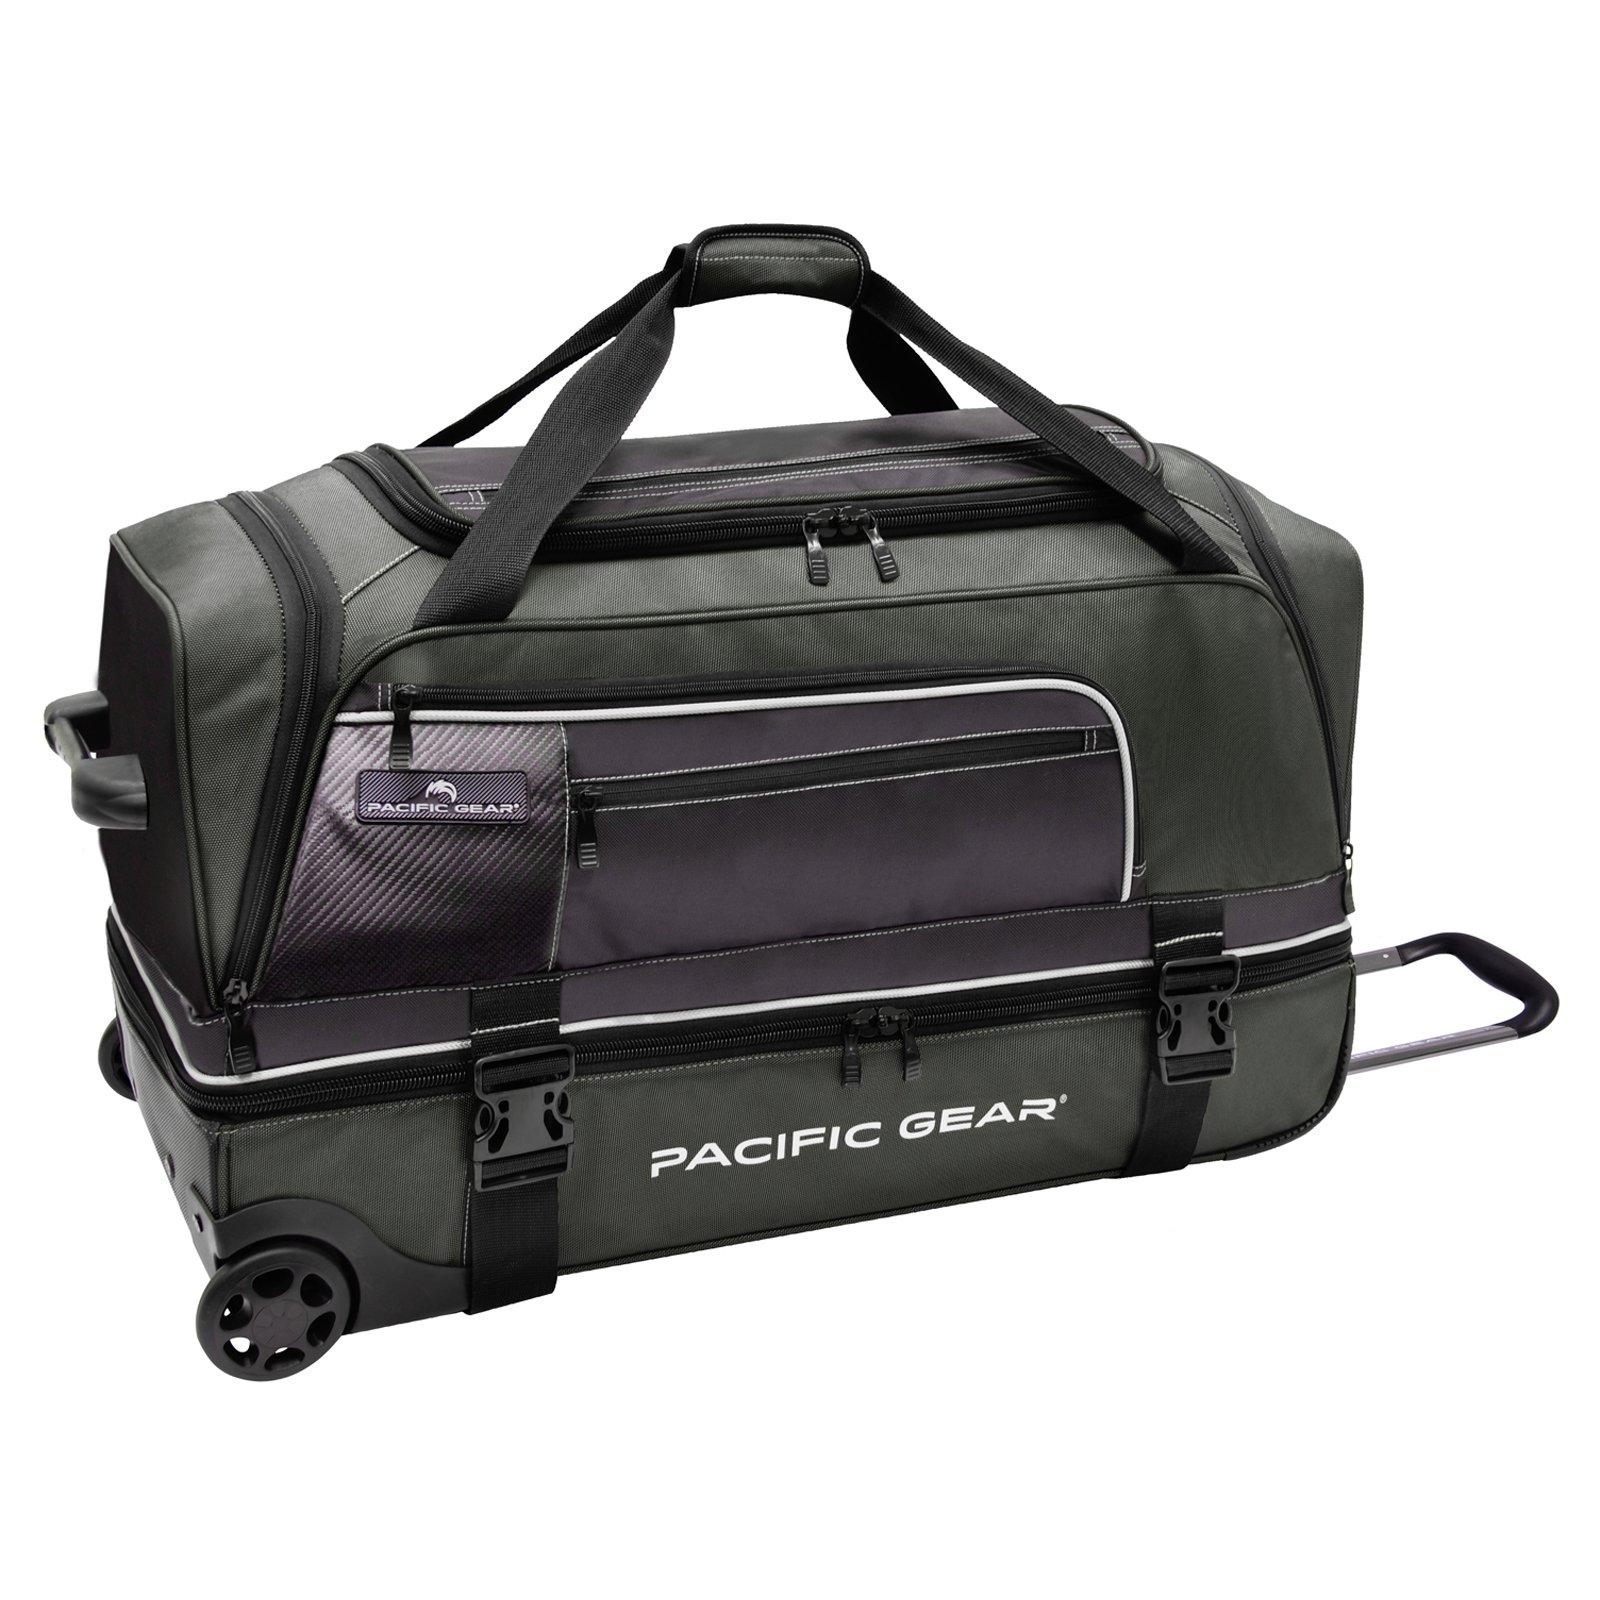 Pacific Gear 30'' Drop-Bottom Rolling Duffel Bag